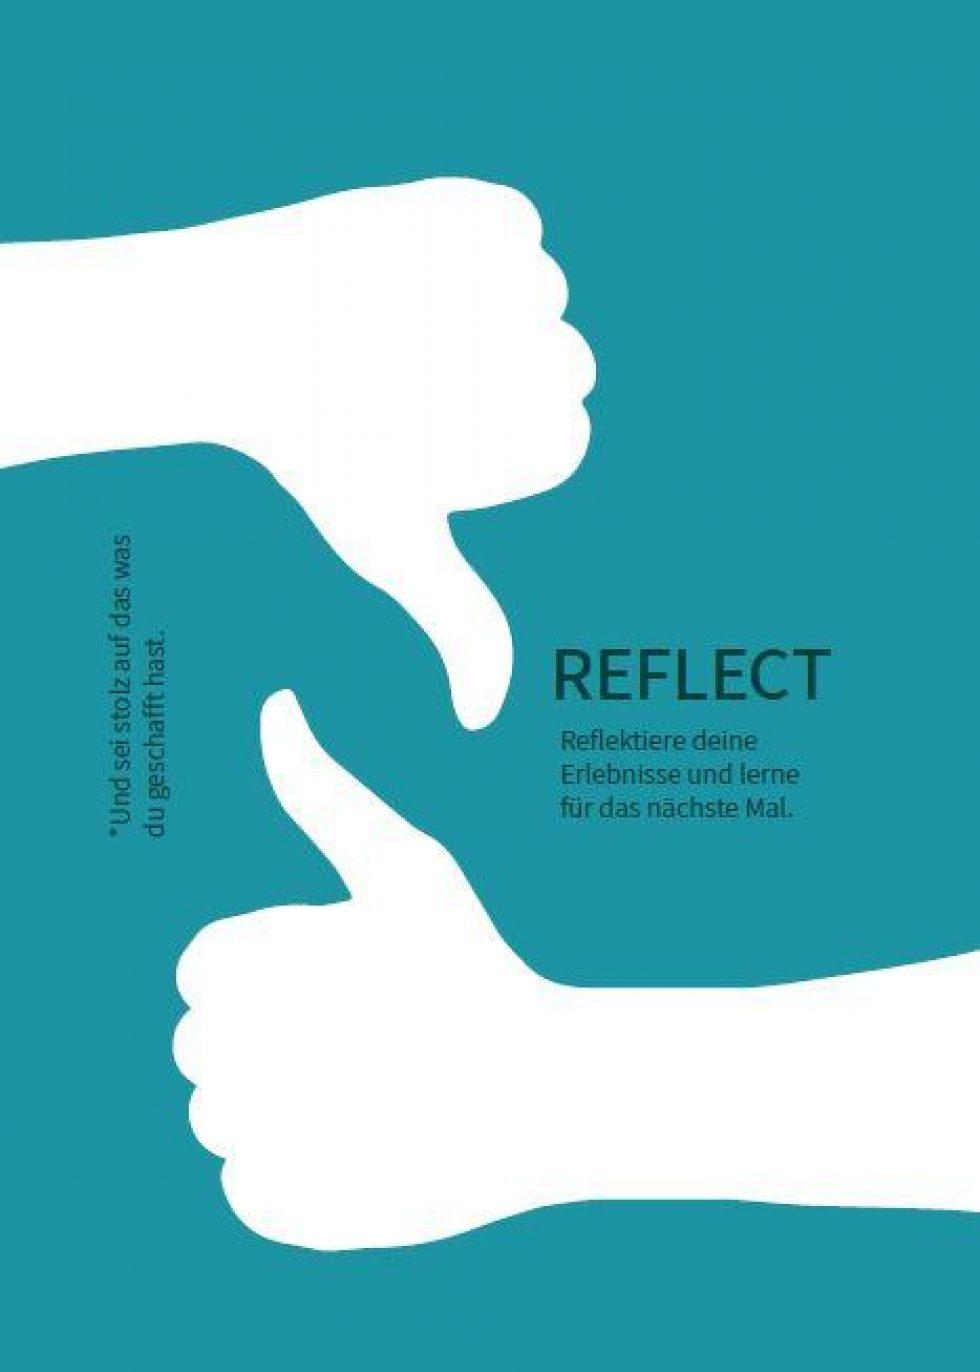 Risiko suchen_reflect